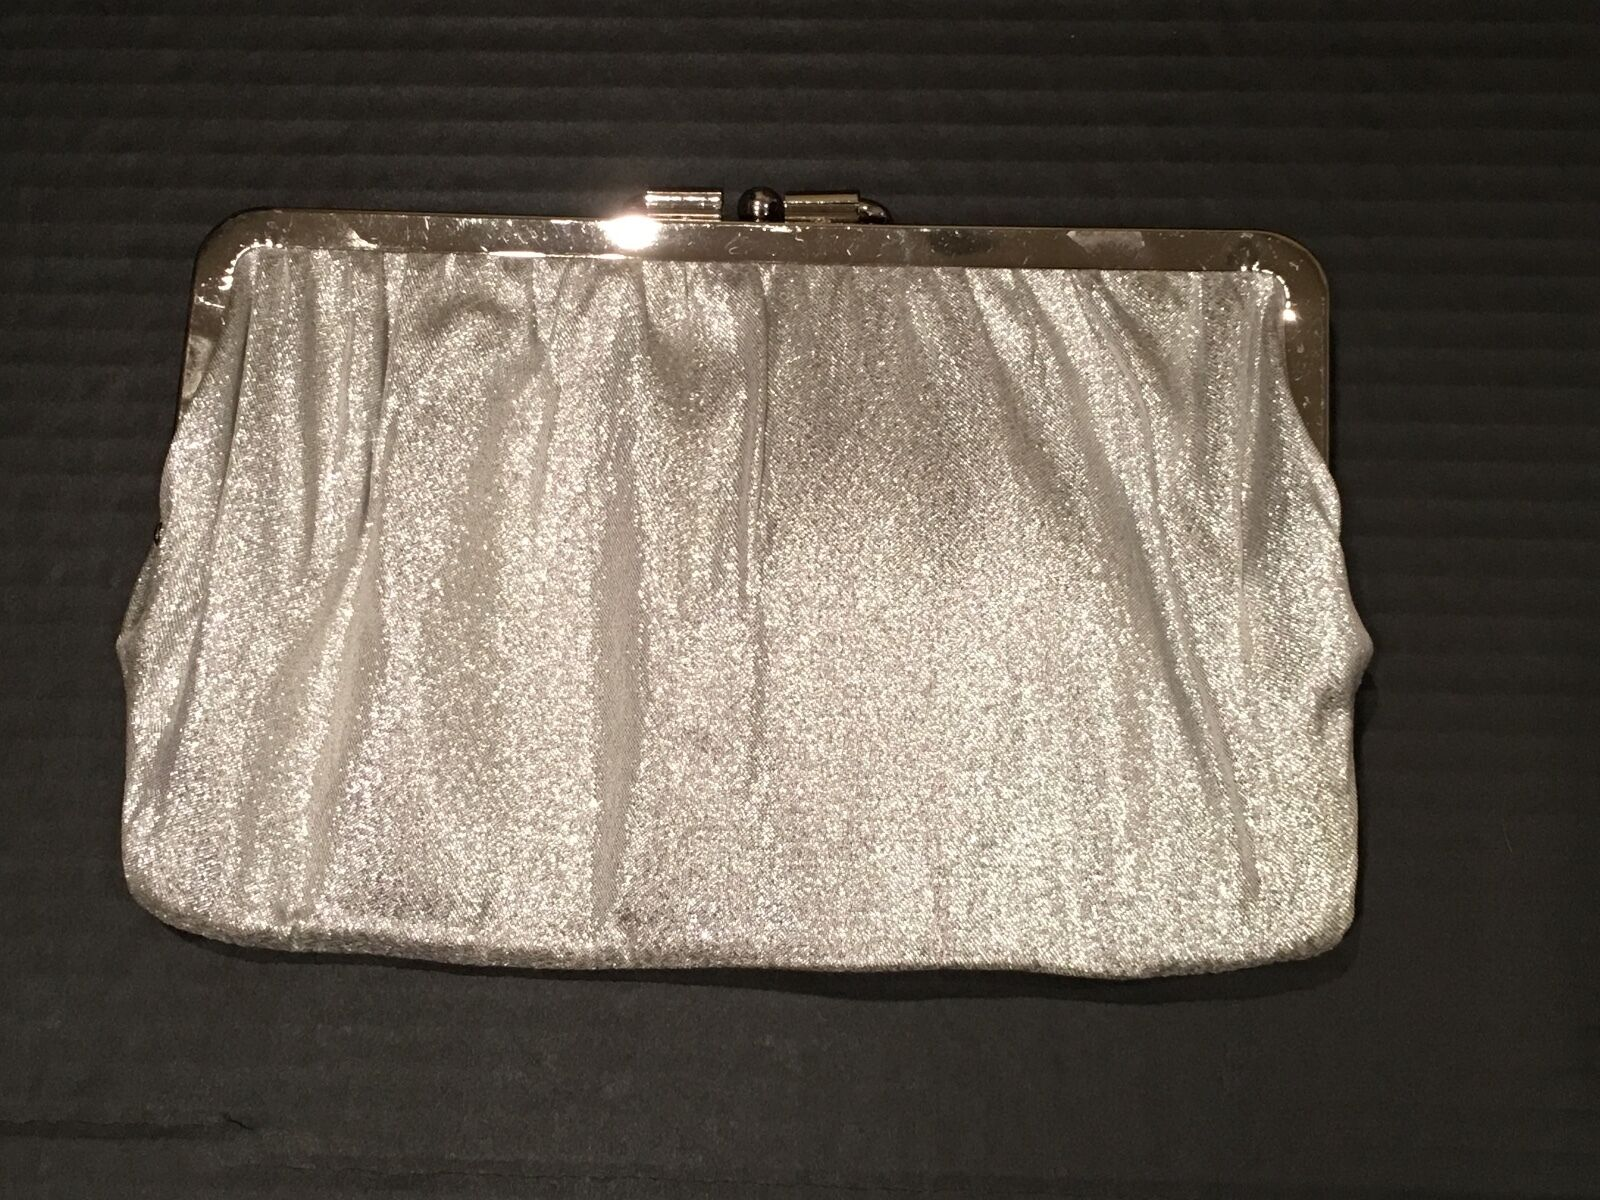 Reversible women's formal dressy clutch bag Black / Silver - Free Shipping